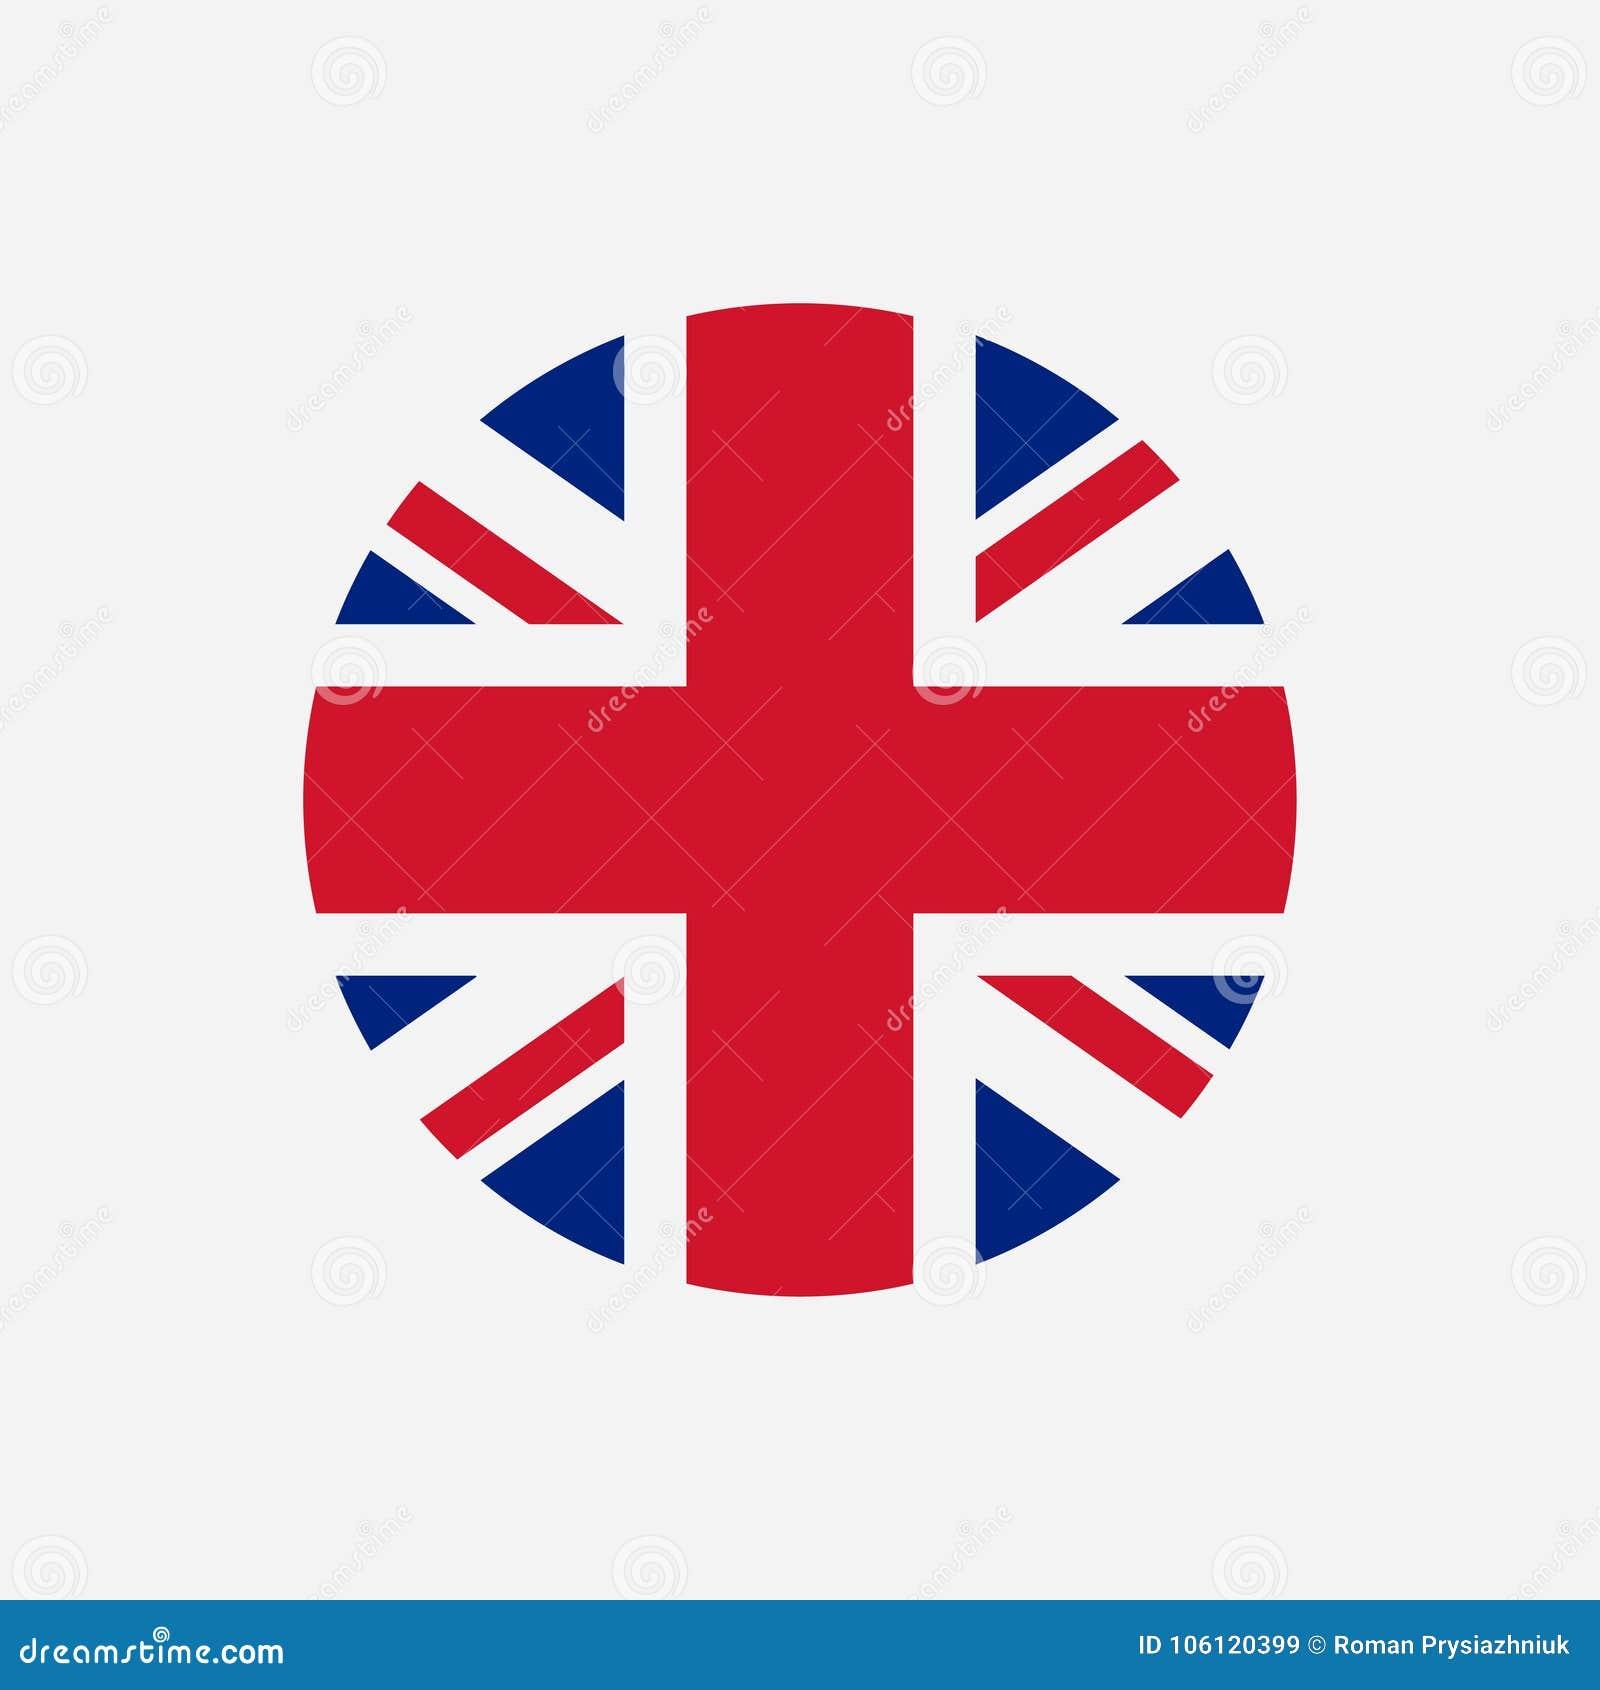 Great Britain flag. Union Jack round logo. Circle icon of United Kingdom flag. Vector.